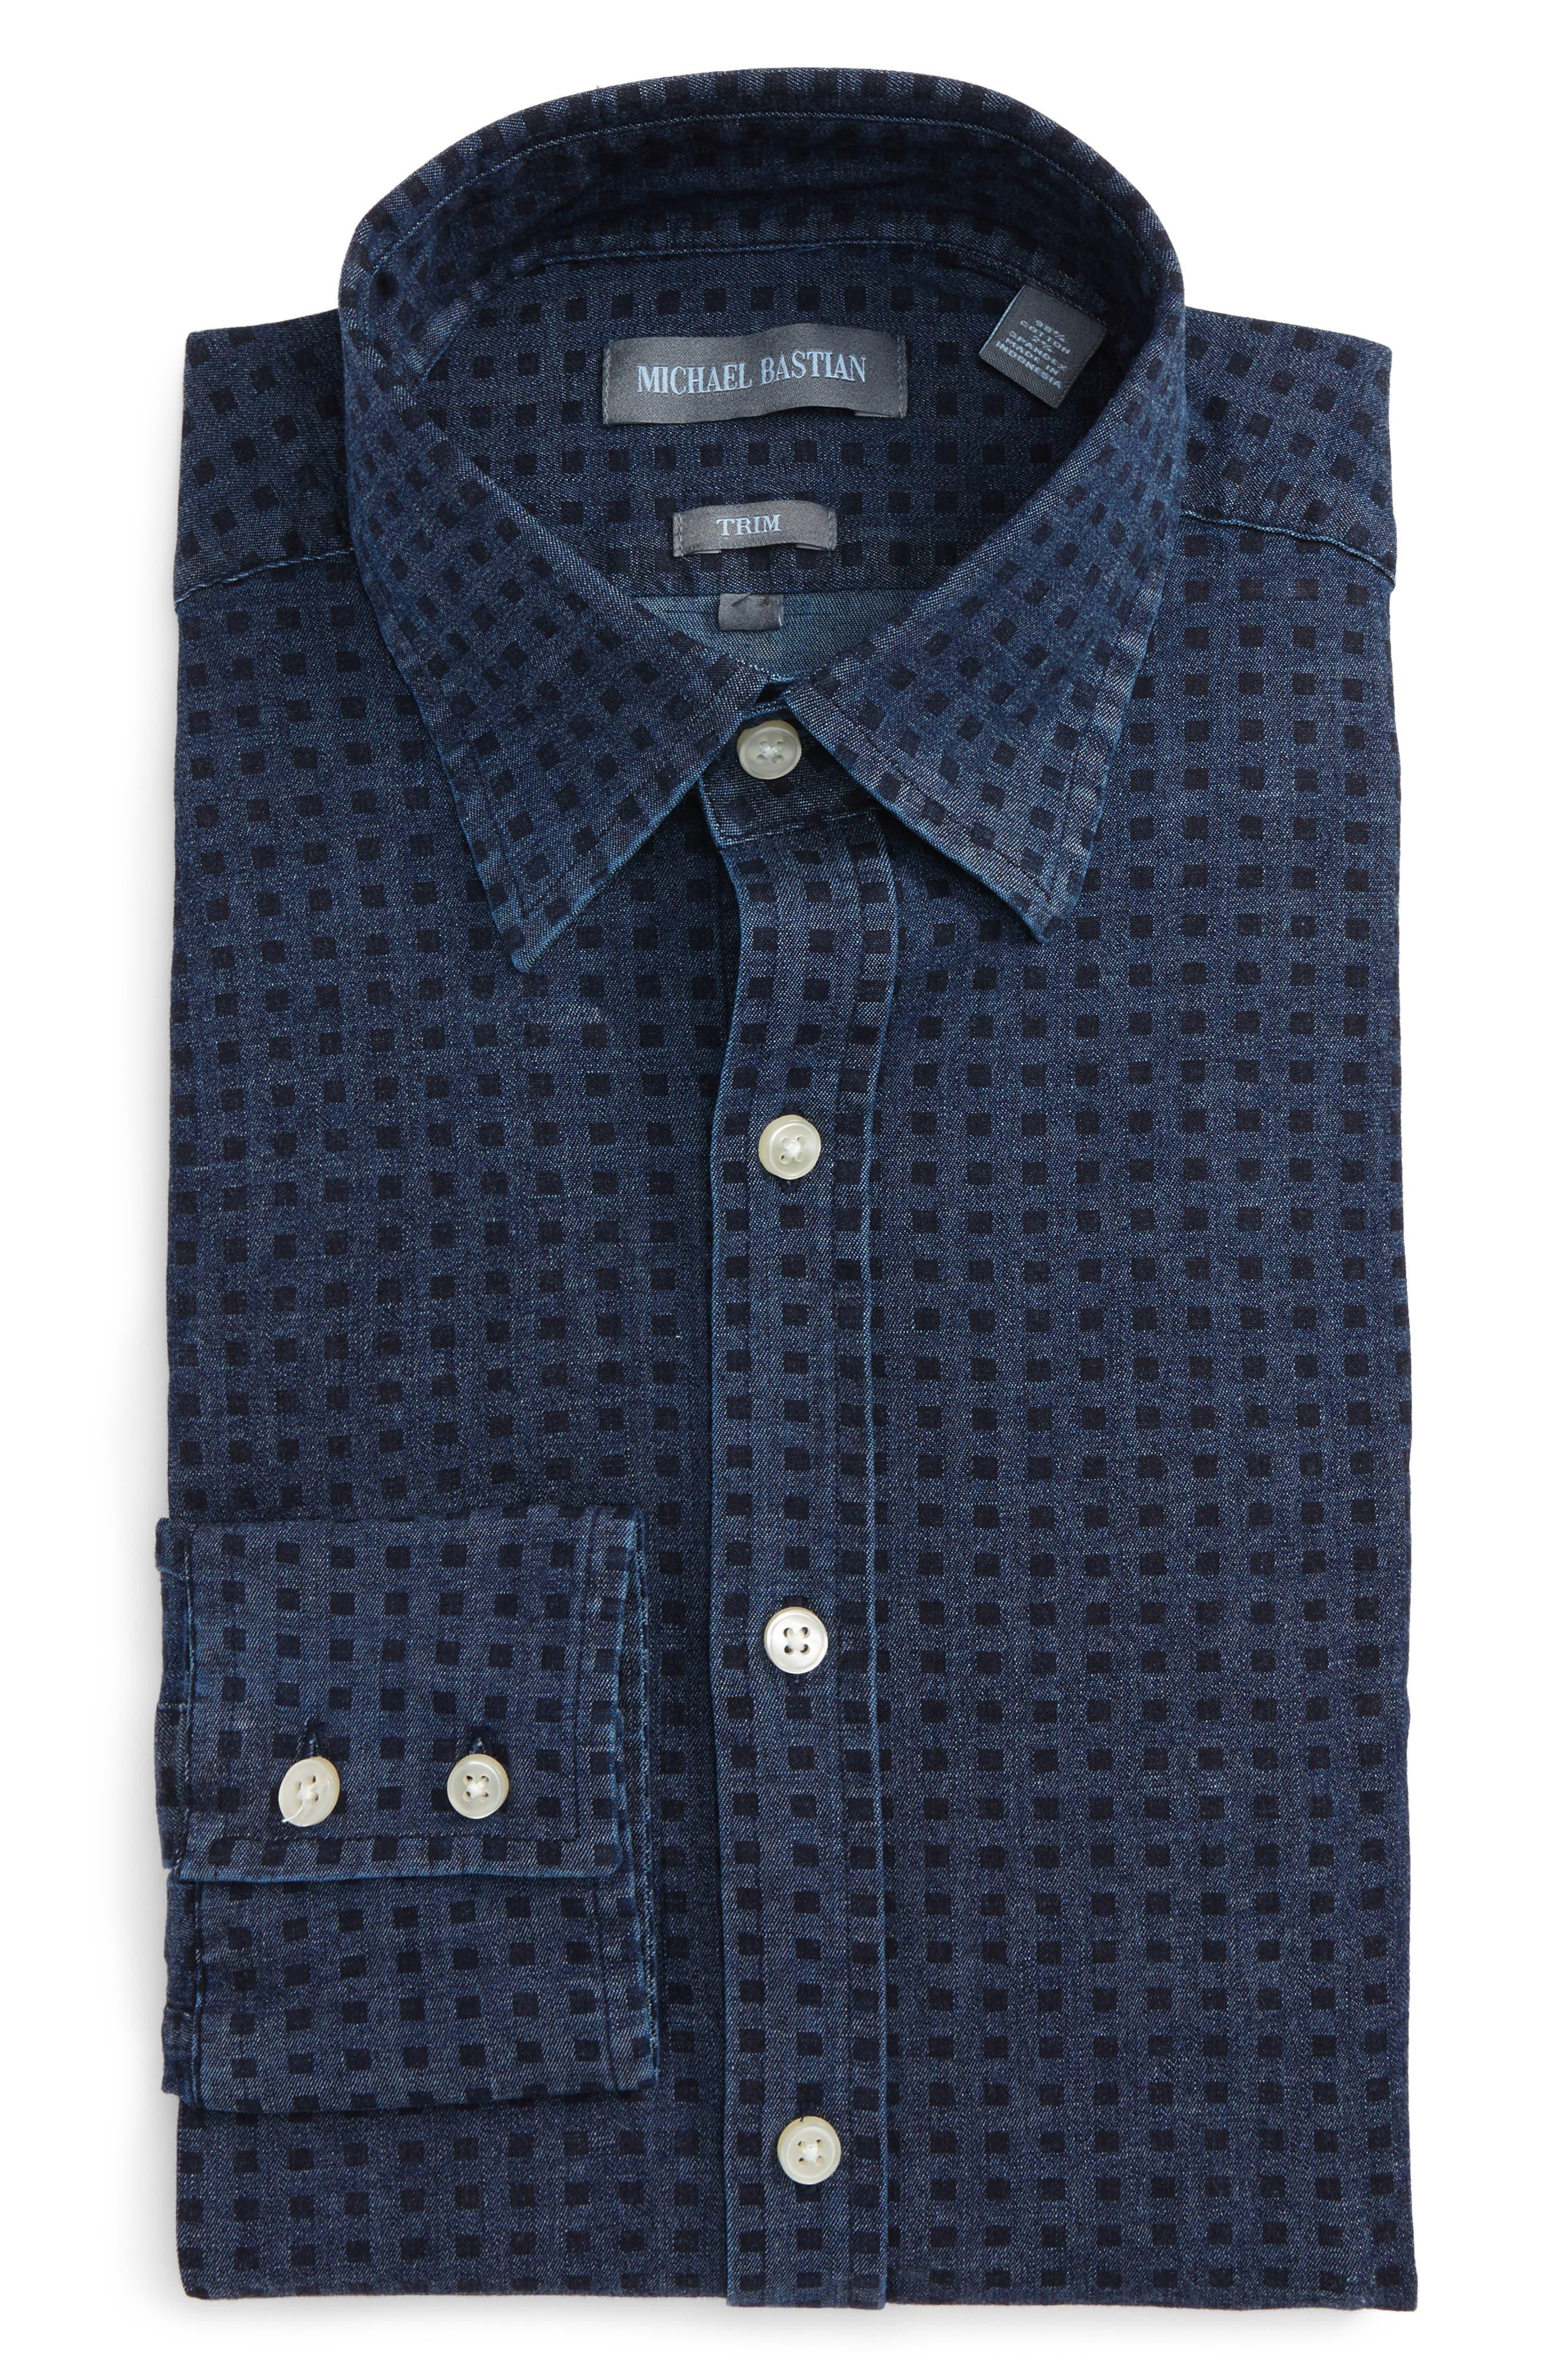 Michael Bastian Dot Denim Dress Shirt